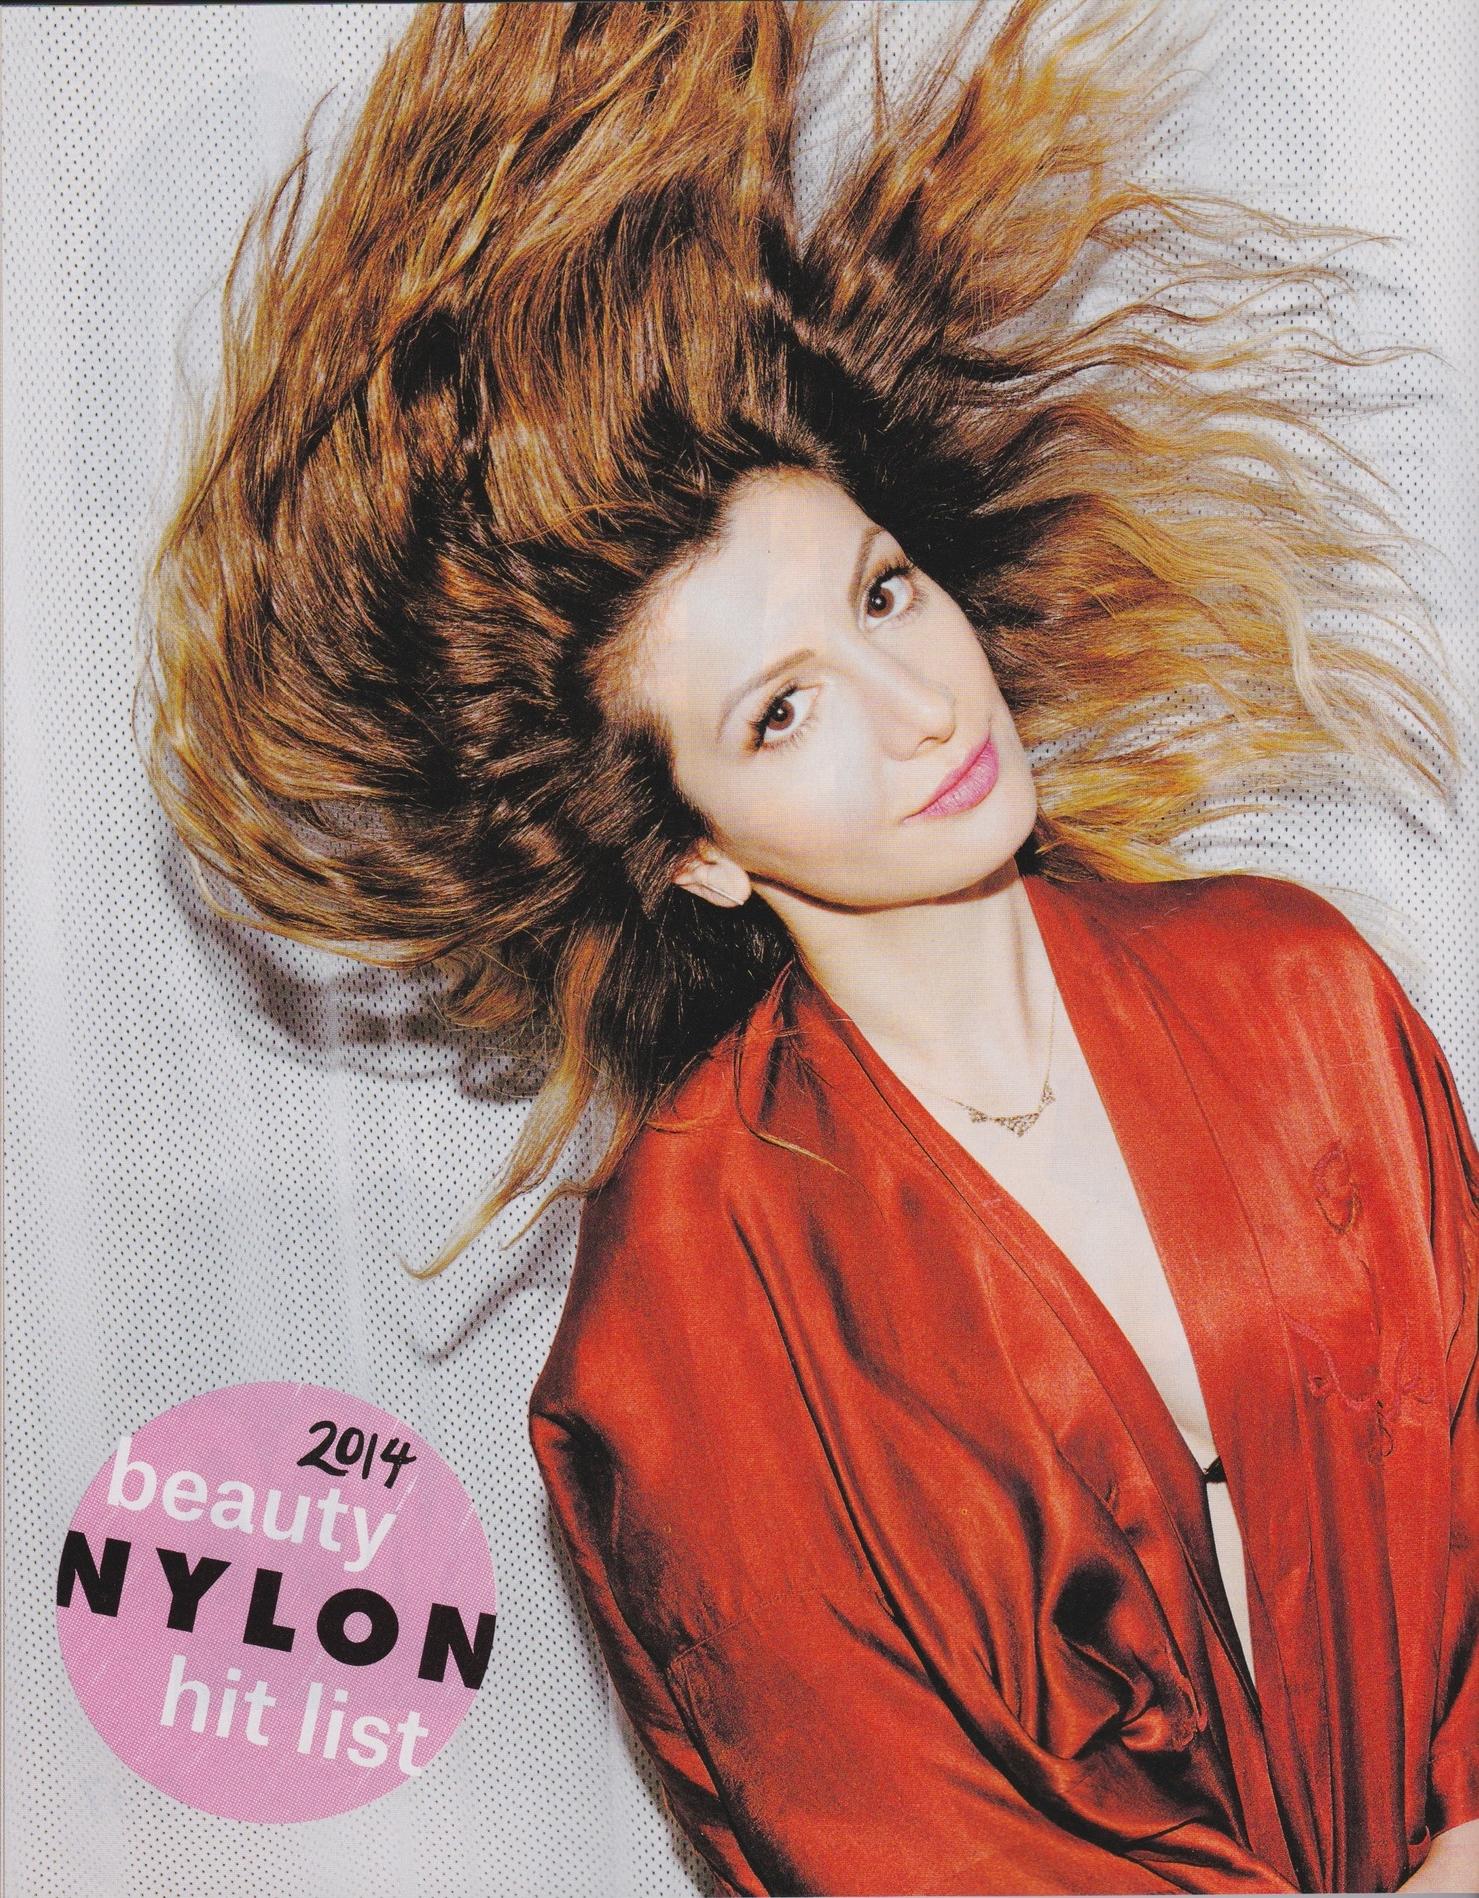 NYLON /Sep 2014